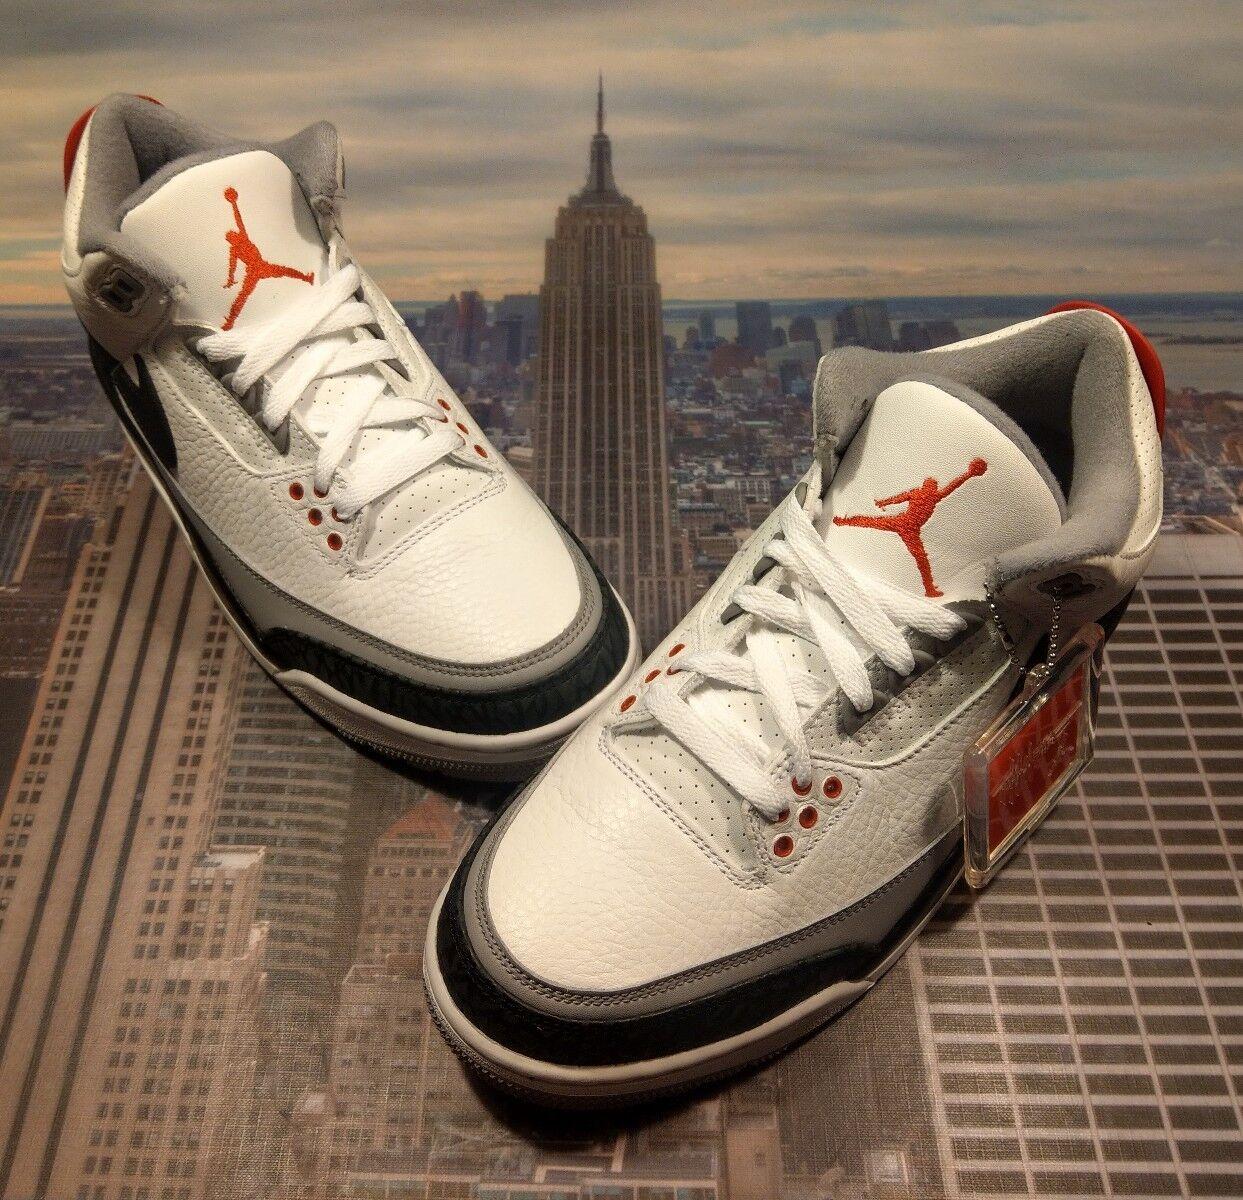 Nike Air Jordan III 3 Retro Tinker NRG White/Black-Red Size 8.5 AQ3835 160 New